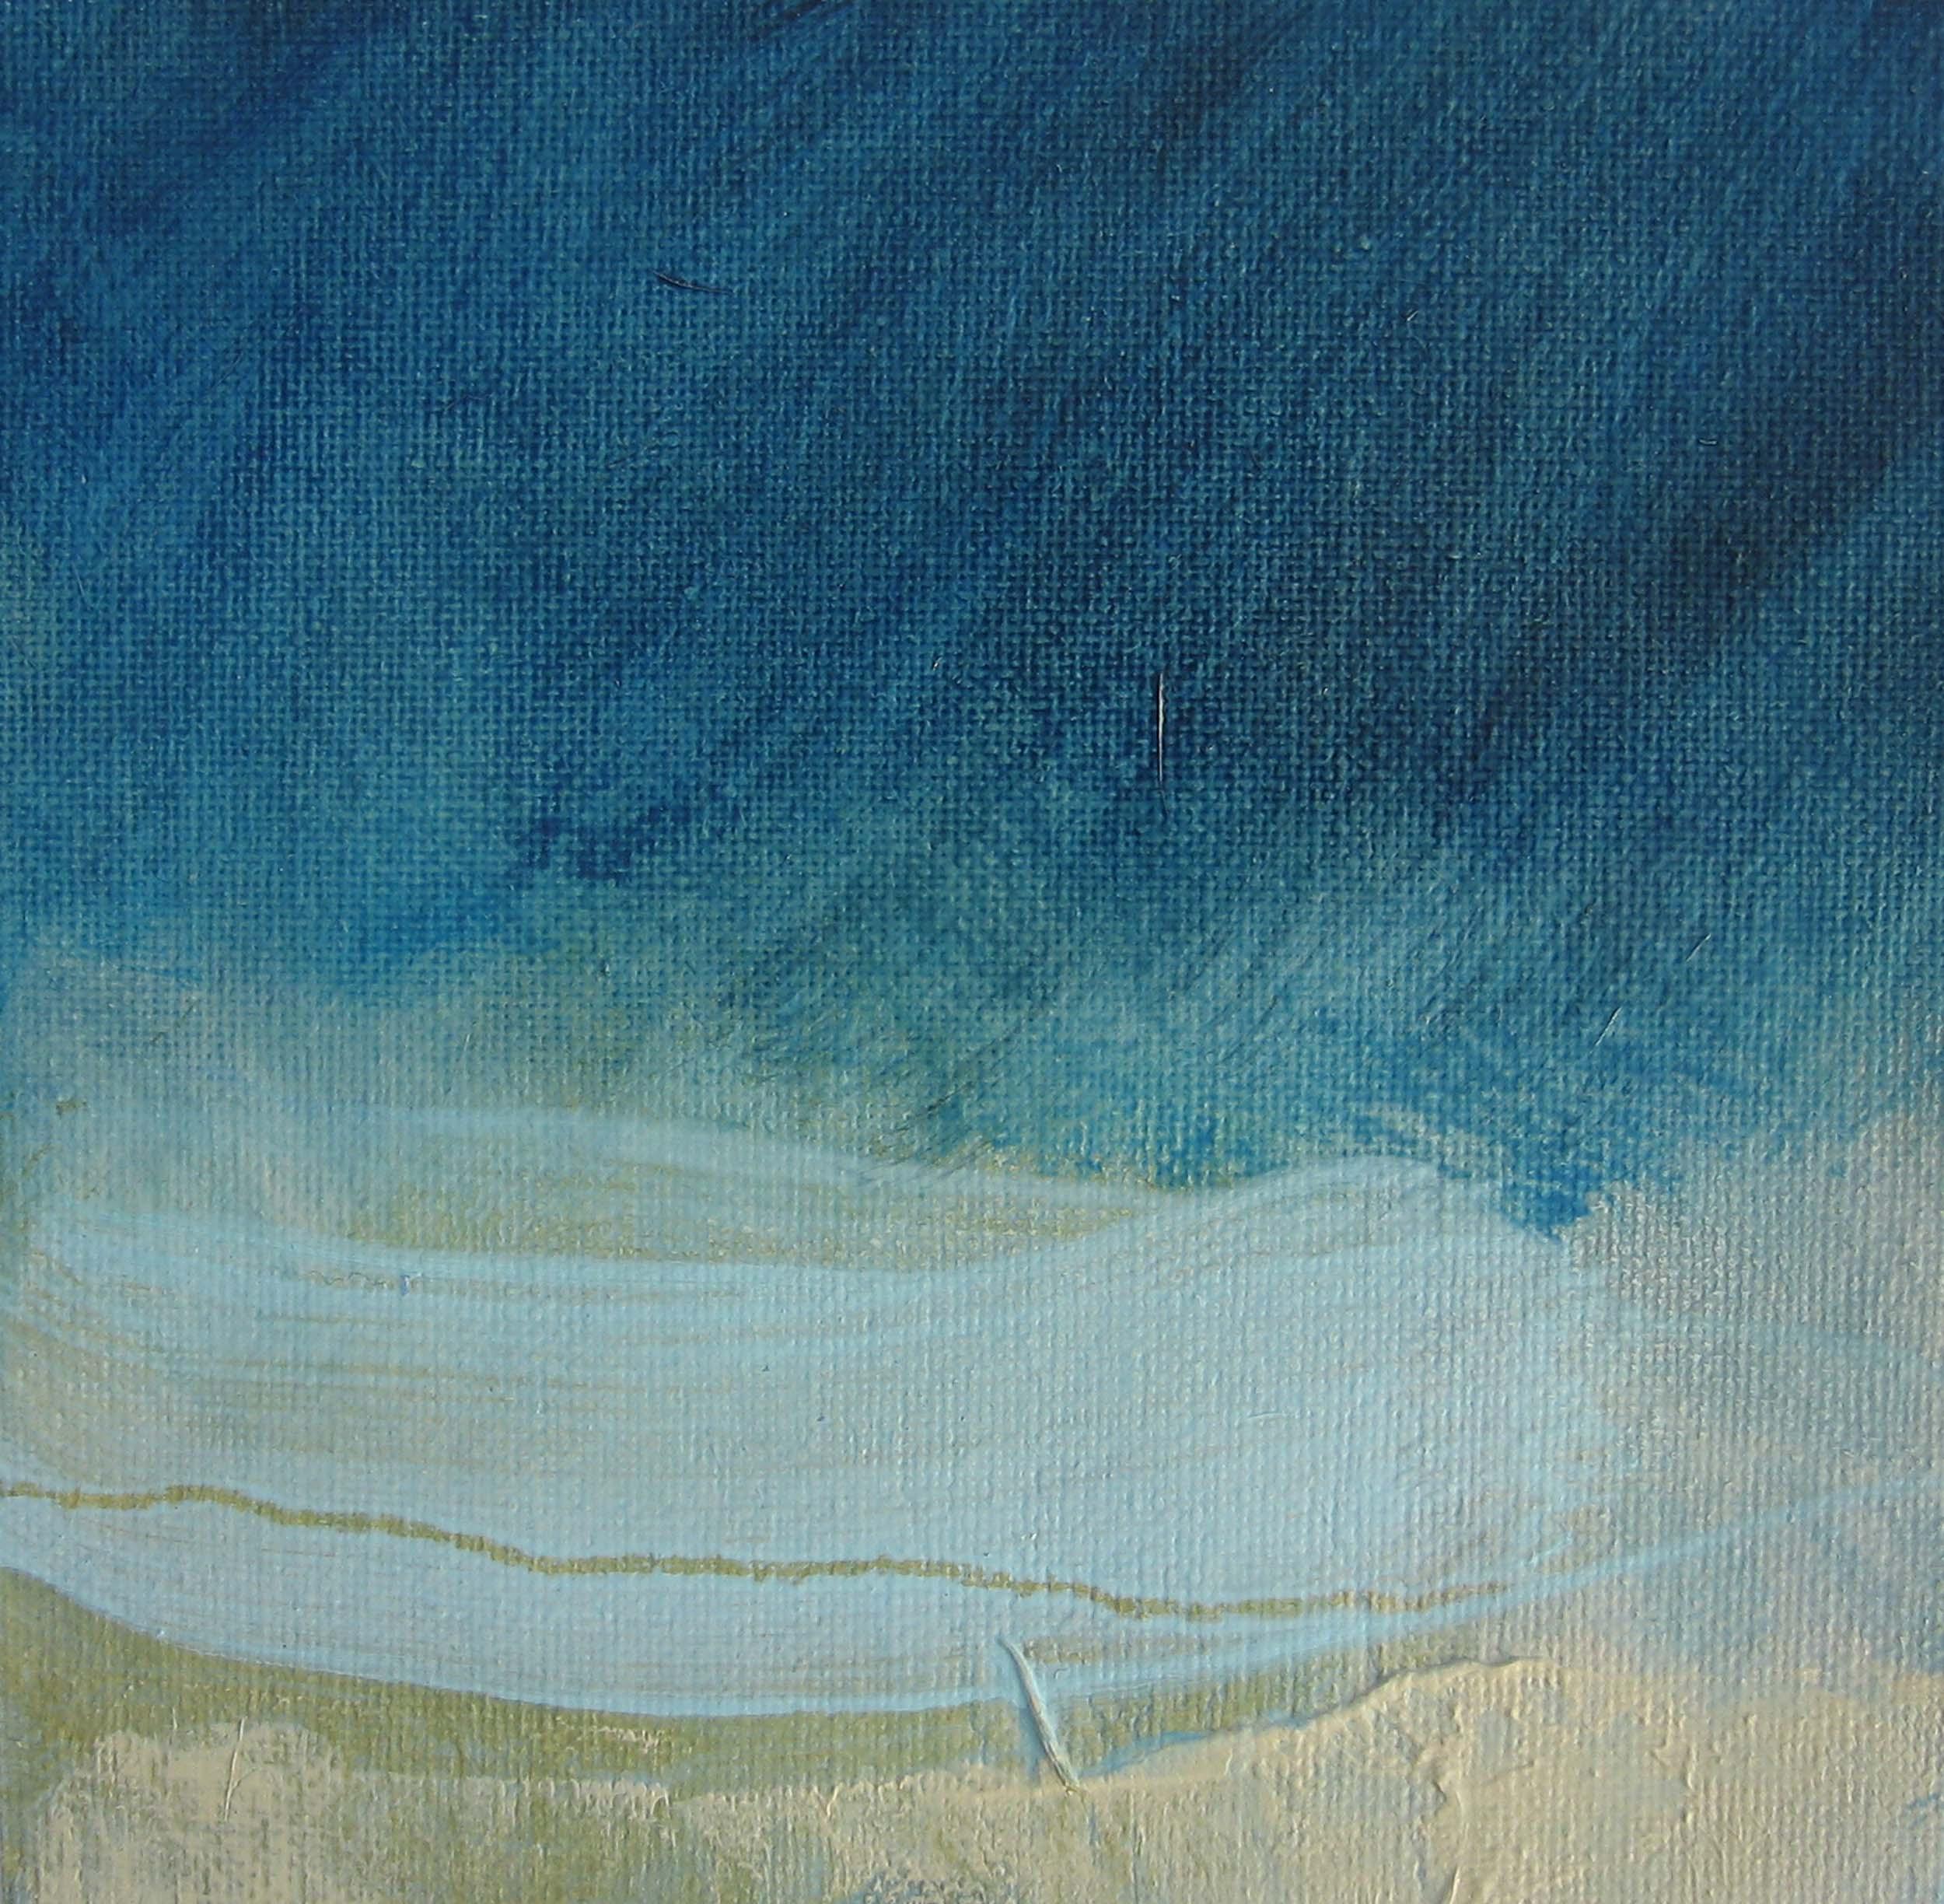 Leah Beggs 2008- Freshwater - Oil on Paper 15 x 15cm_sml.jpg